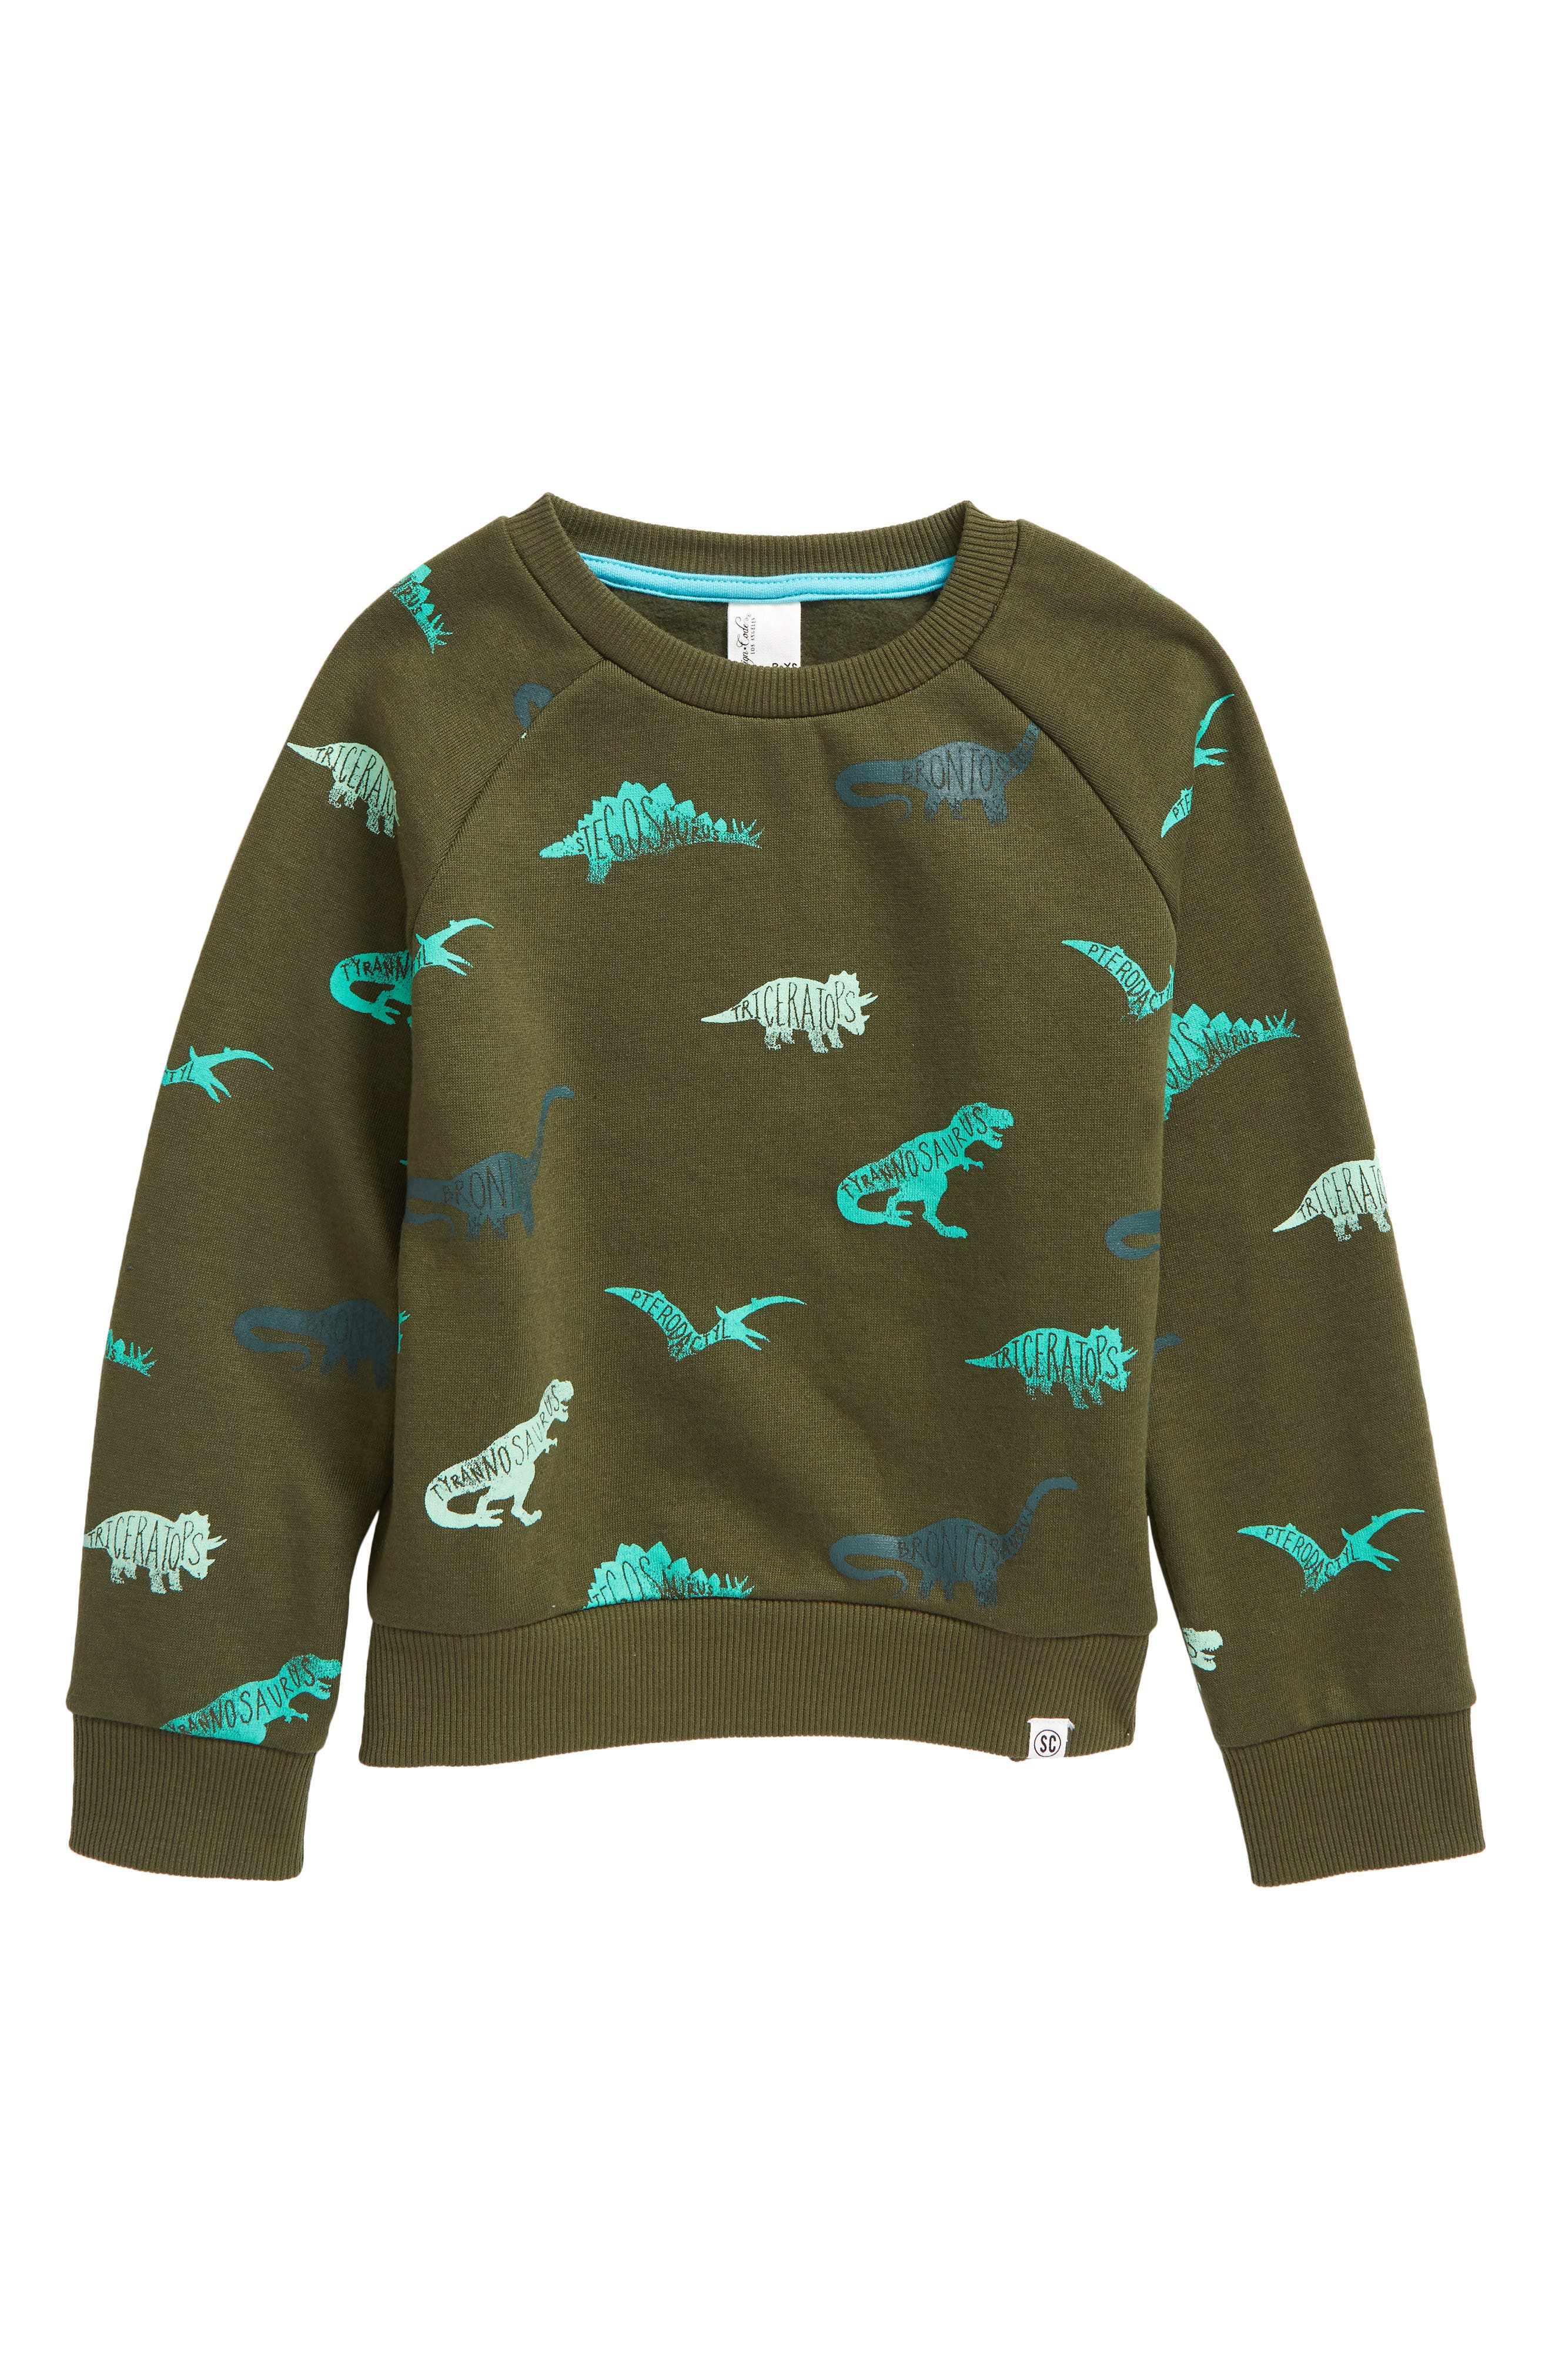 Image of Sovereign Code Bryson Sweatshirt